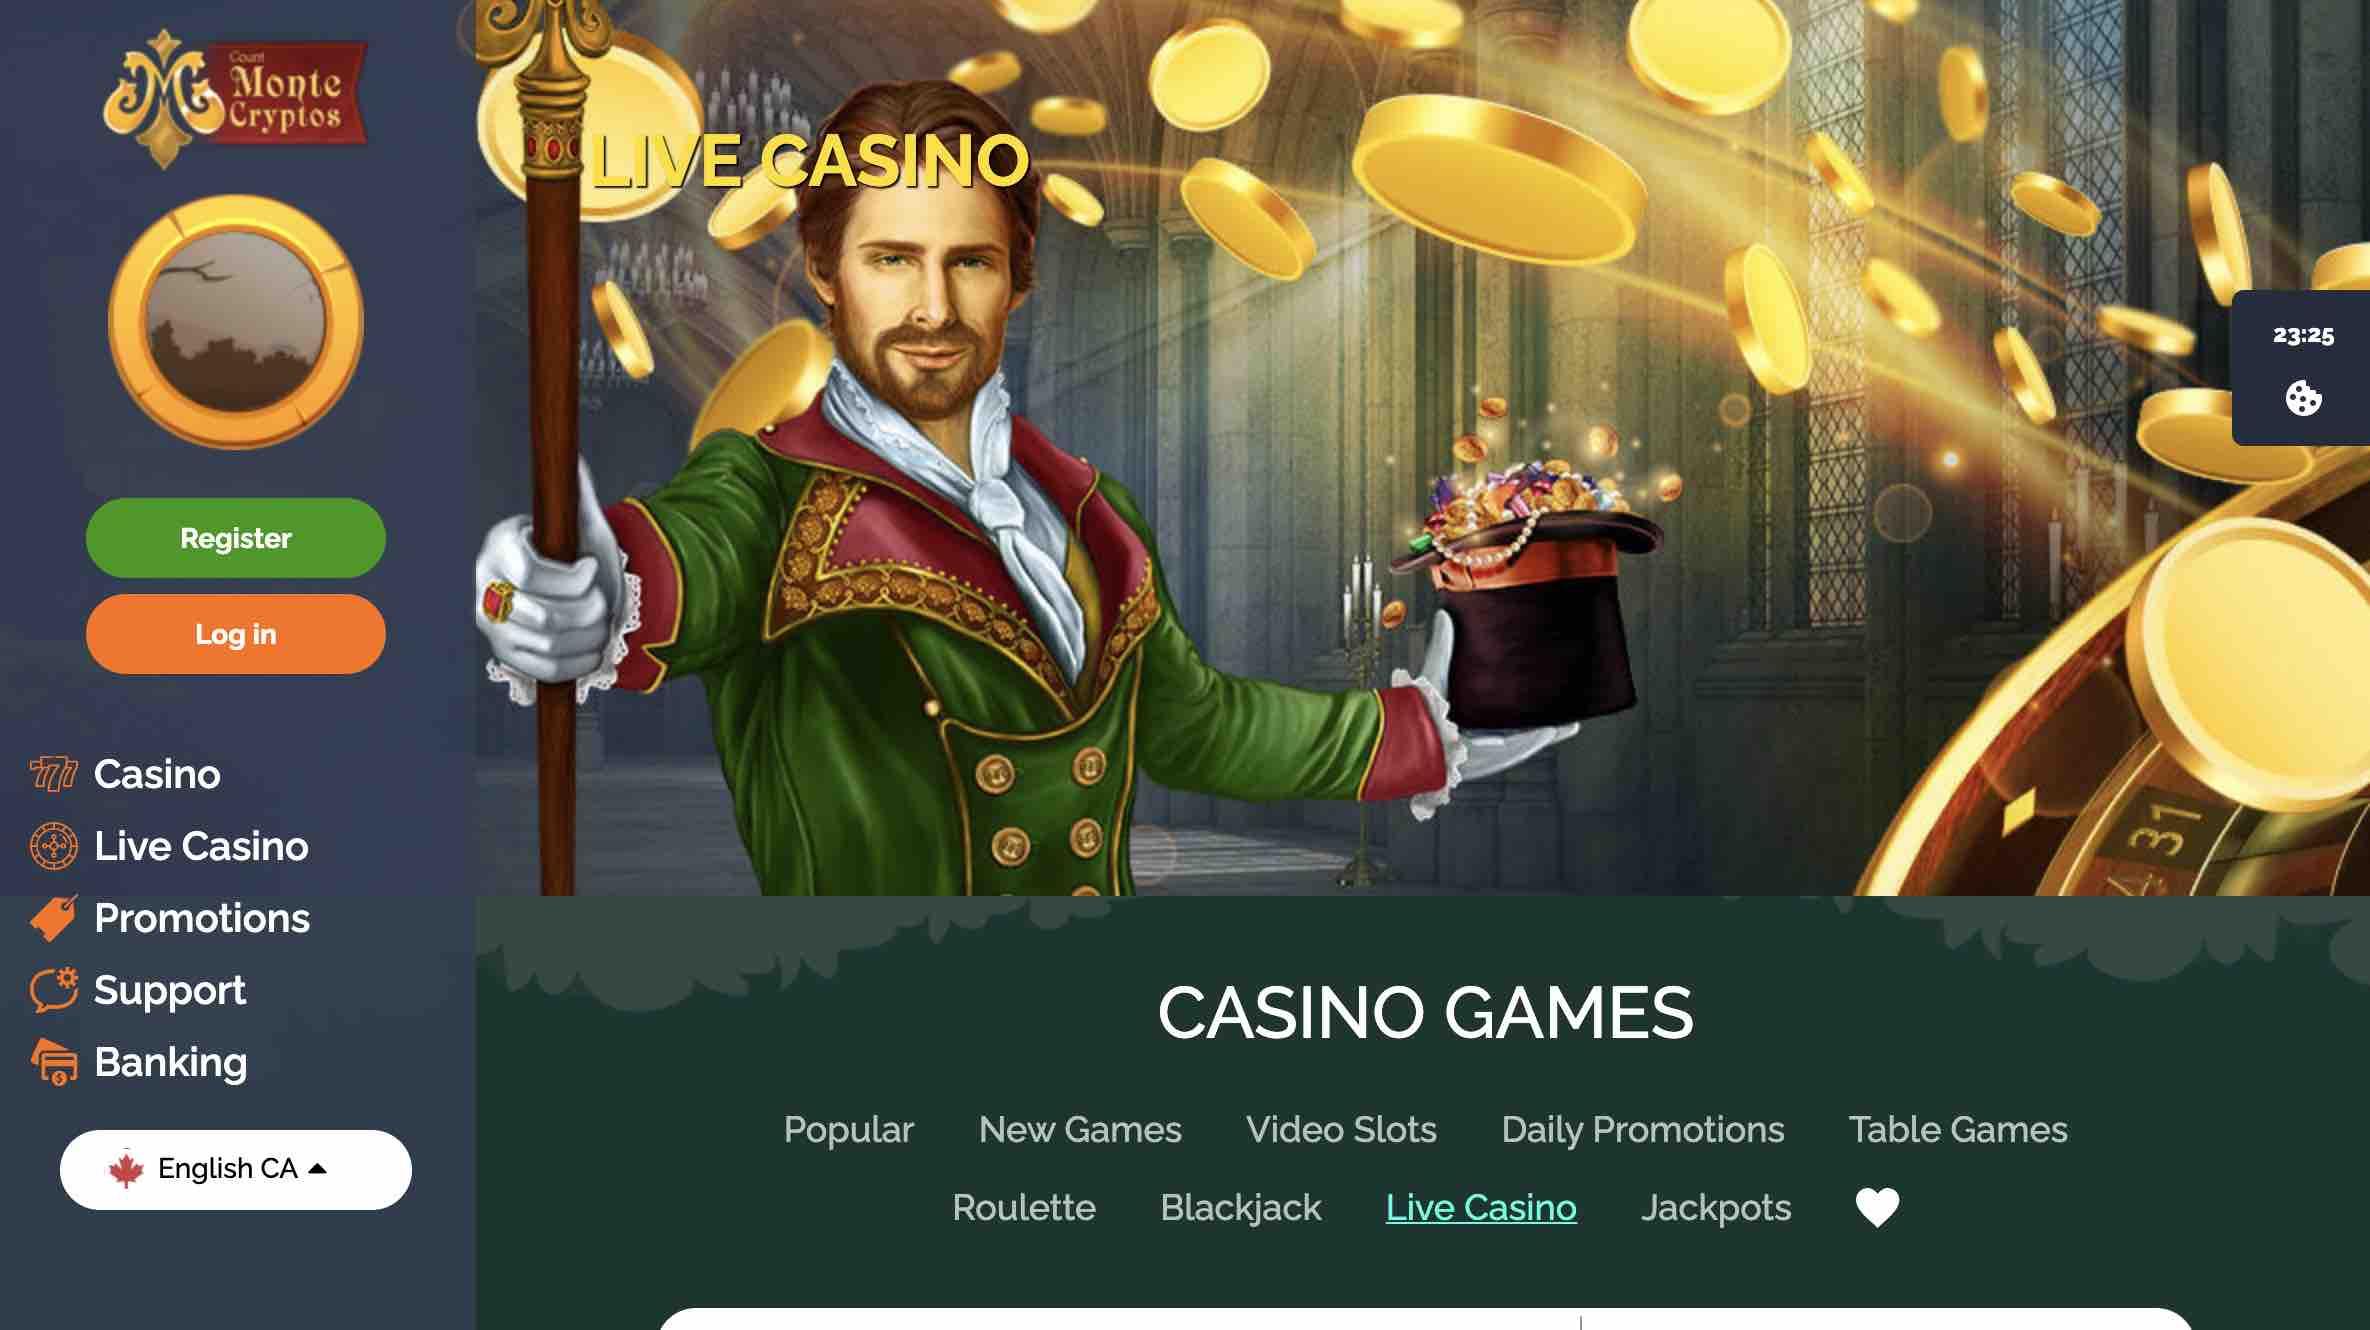 montecryptos casino promotions and more